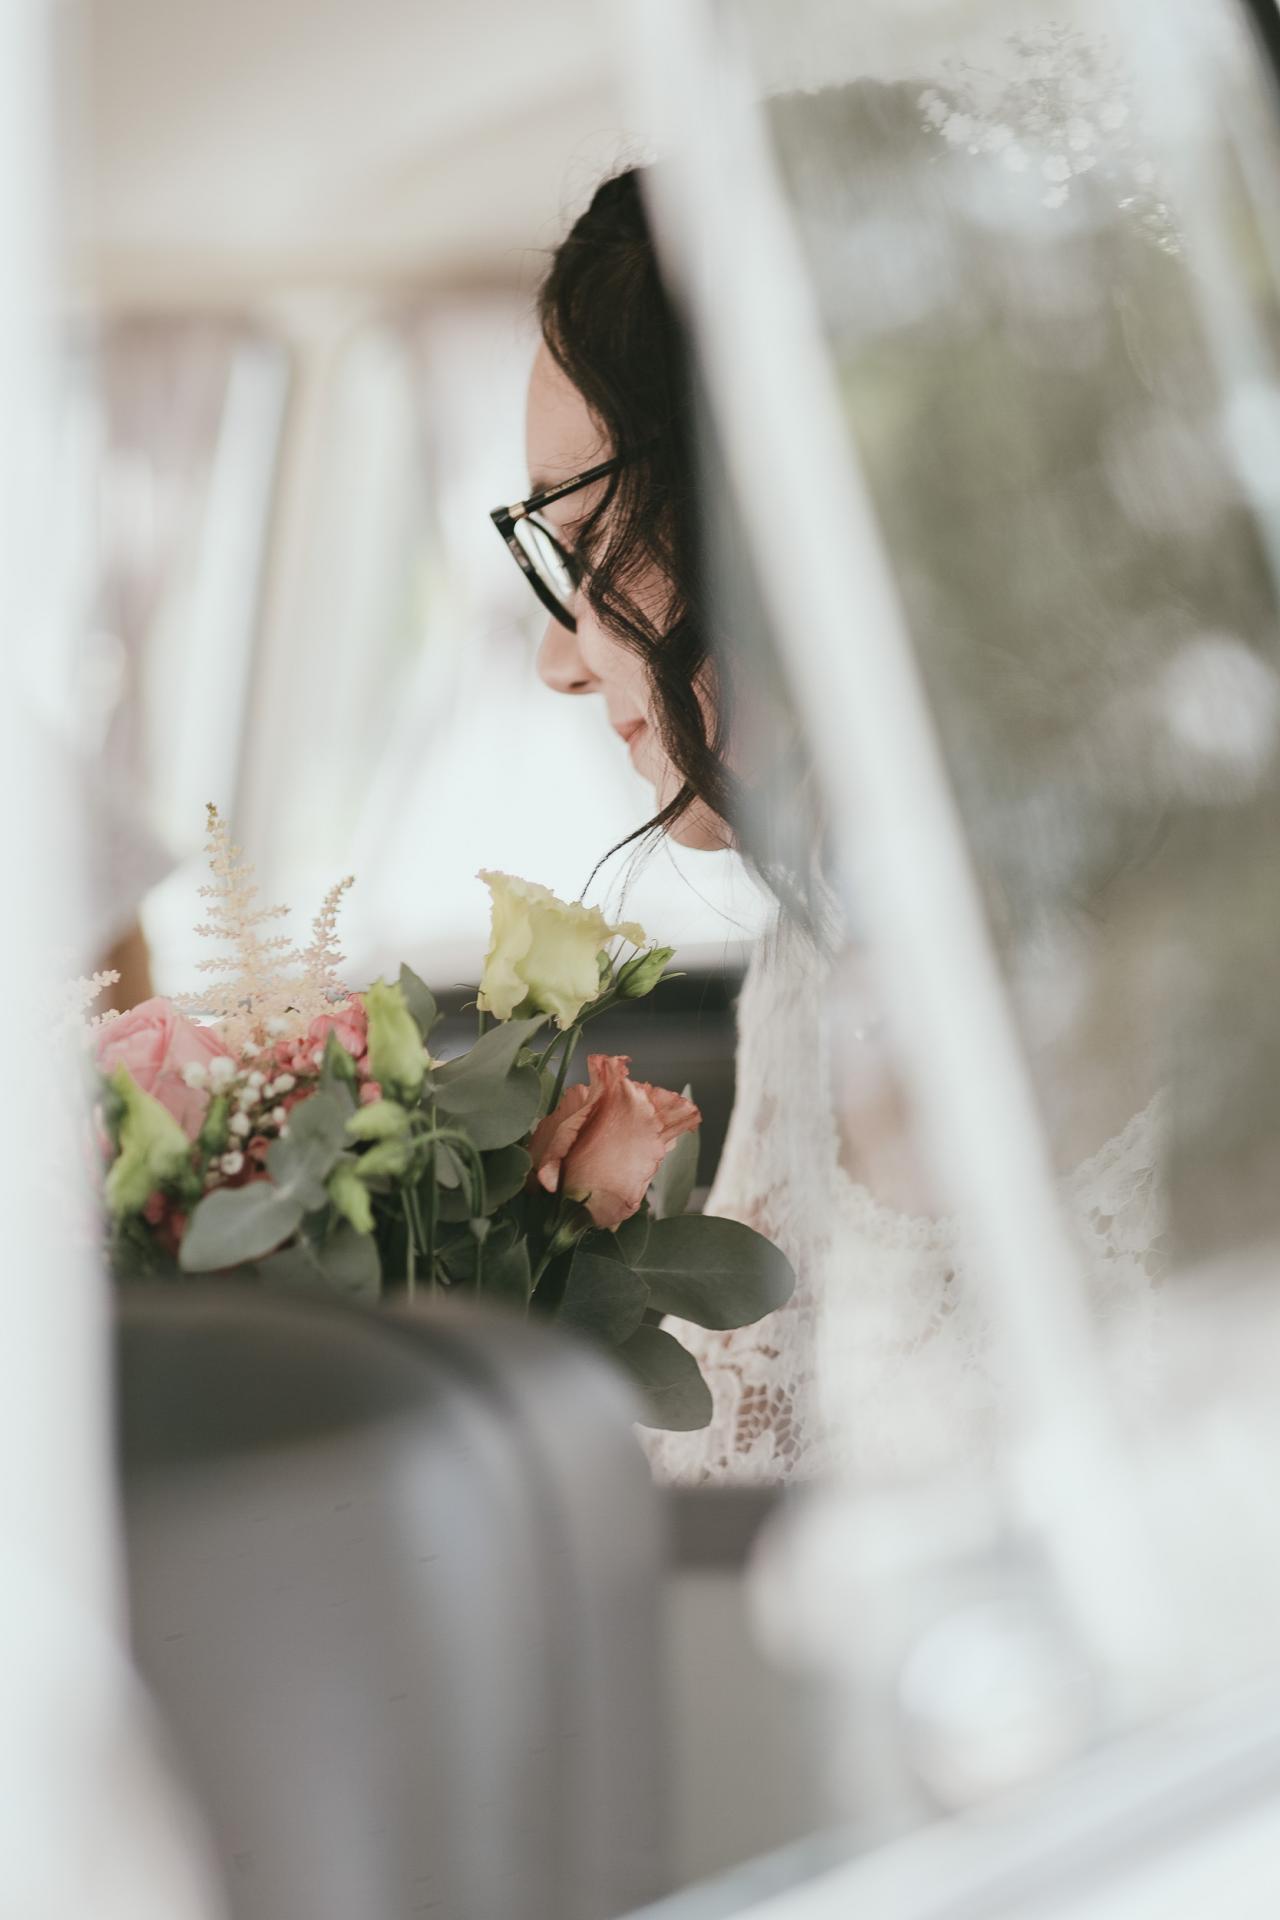 Photographe de mariage moody boho chic boheme dax landes aquitaine fineart 21